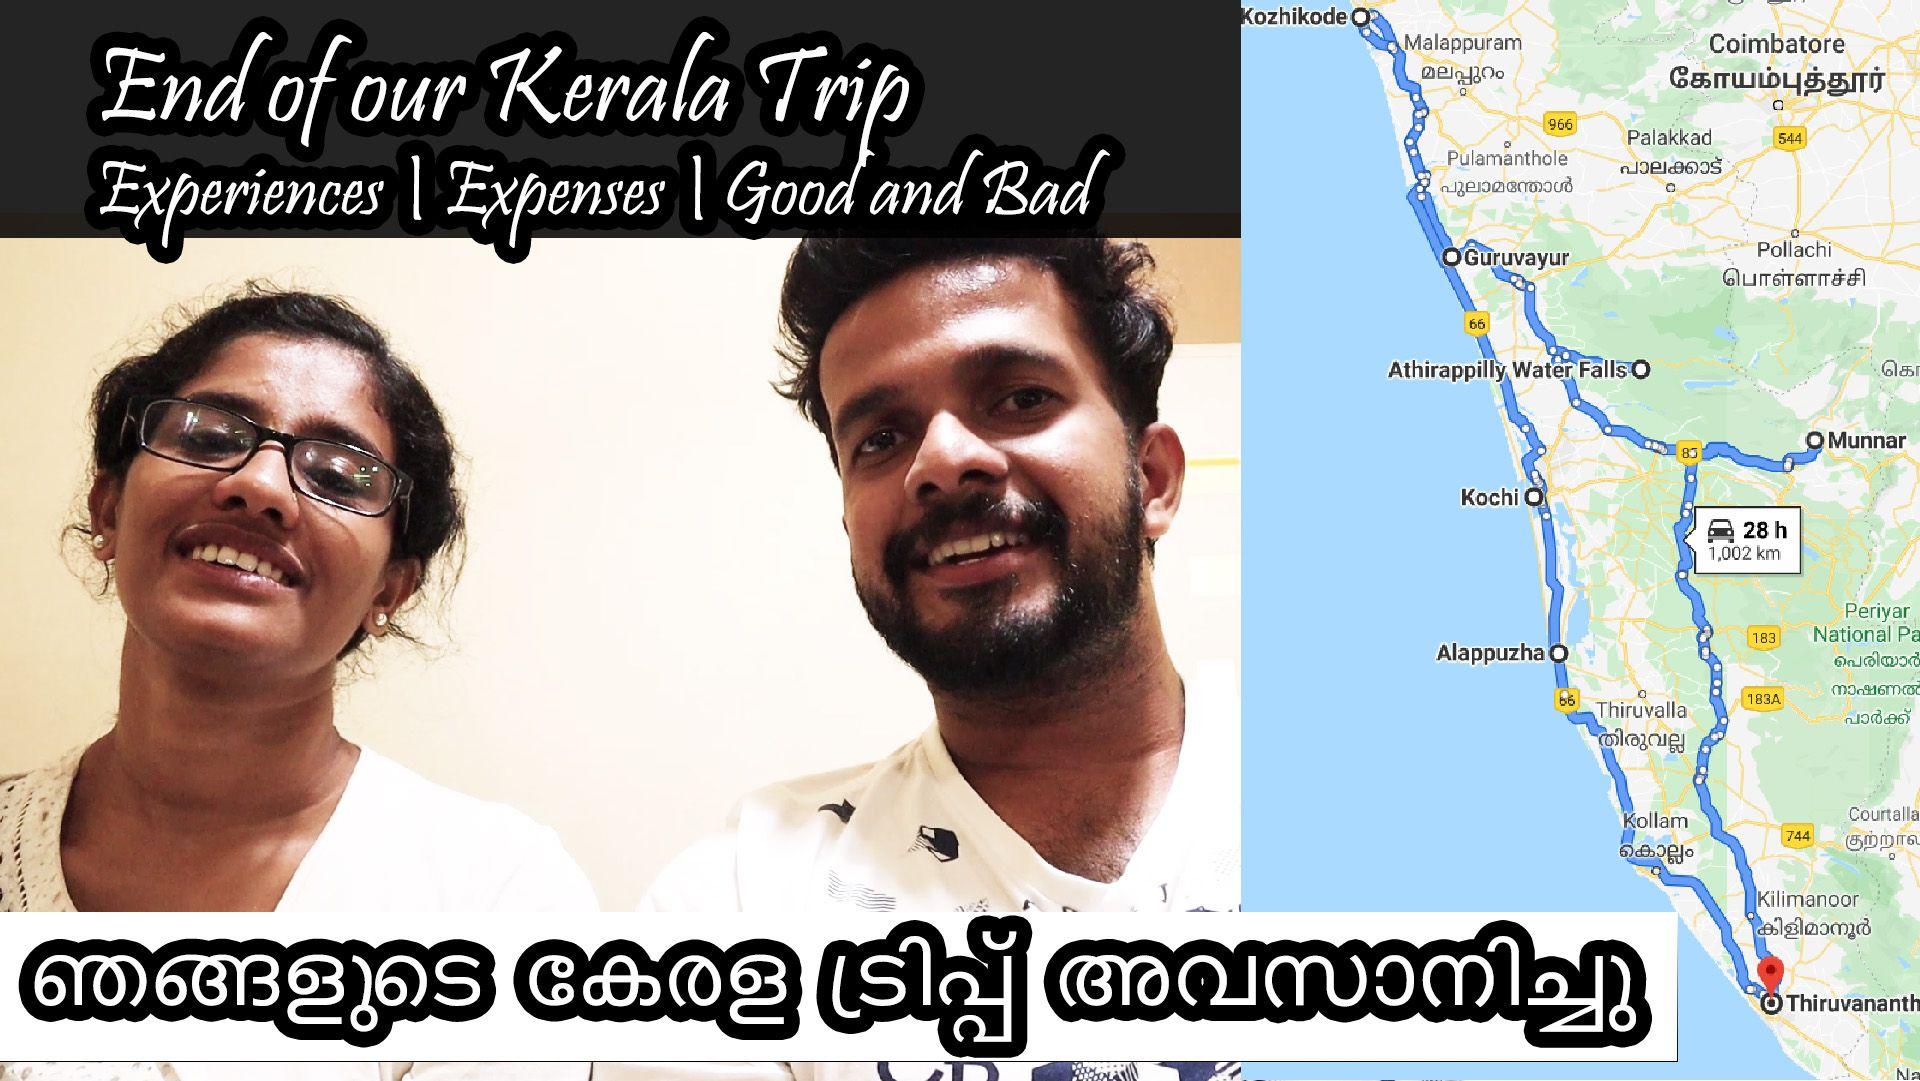 Kerala Trip Ending How to plan? Experiences Expenses